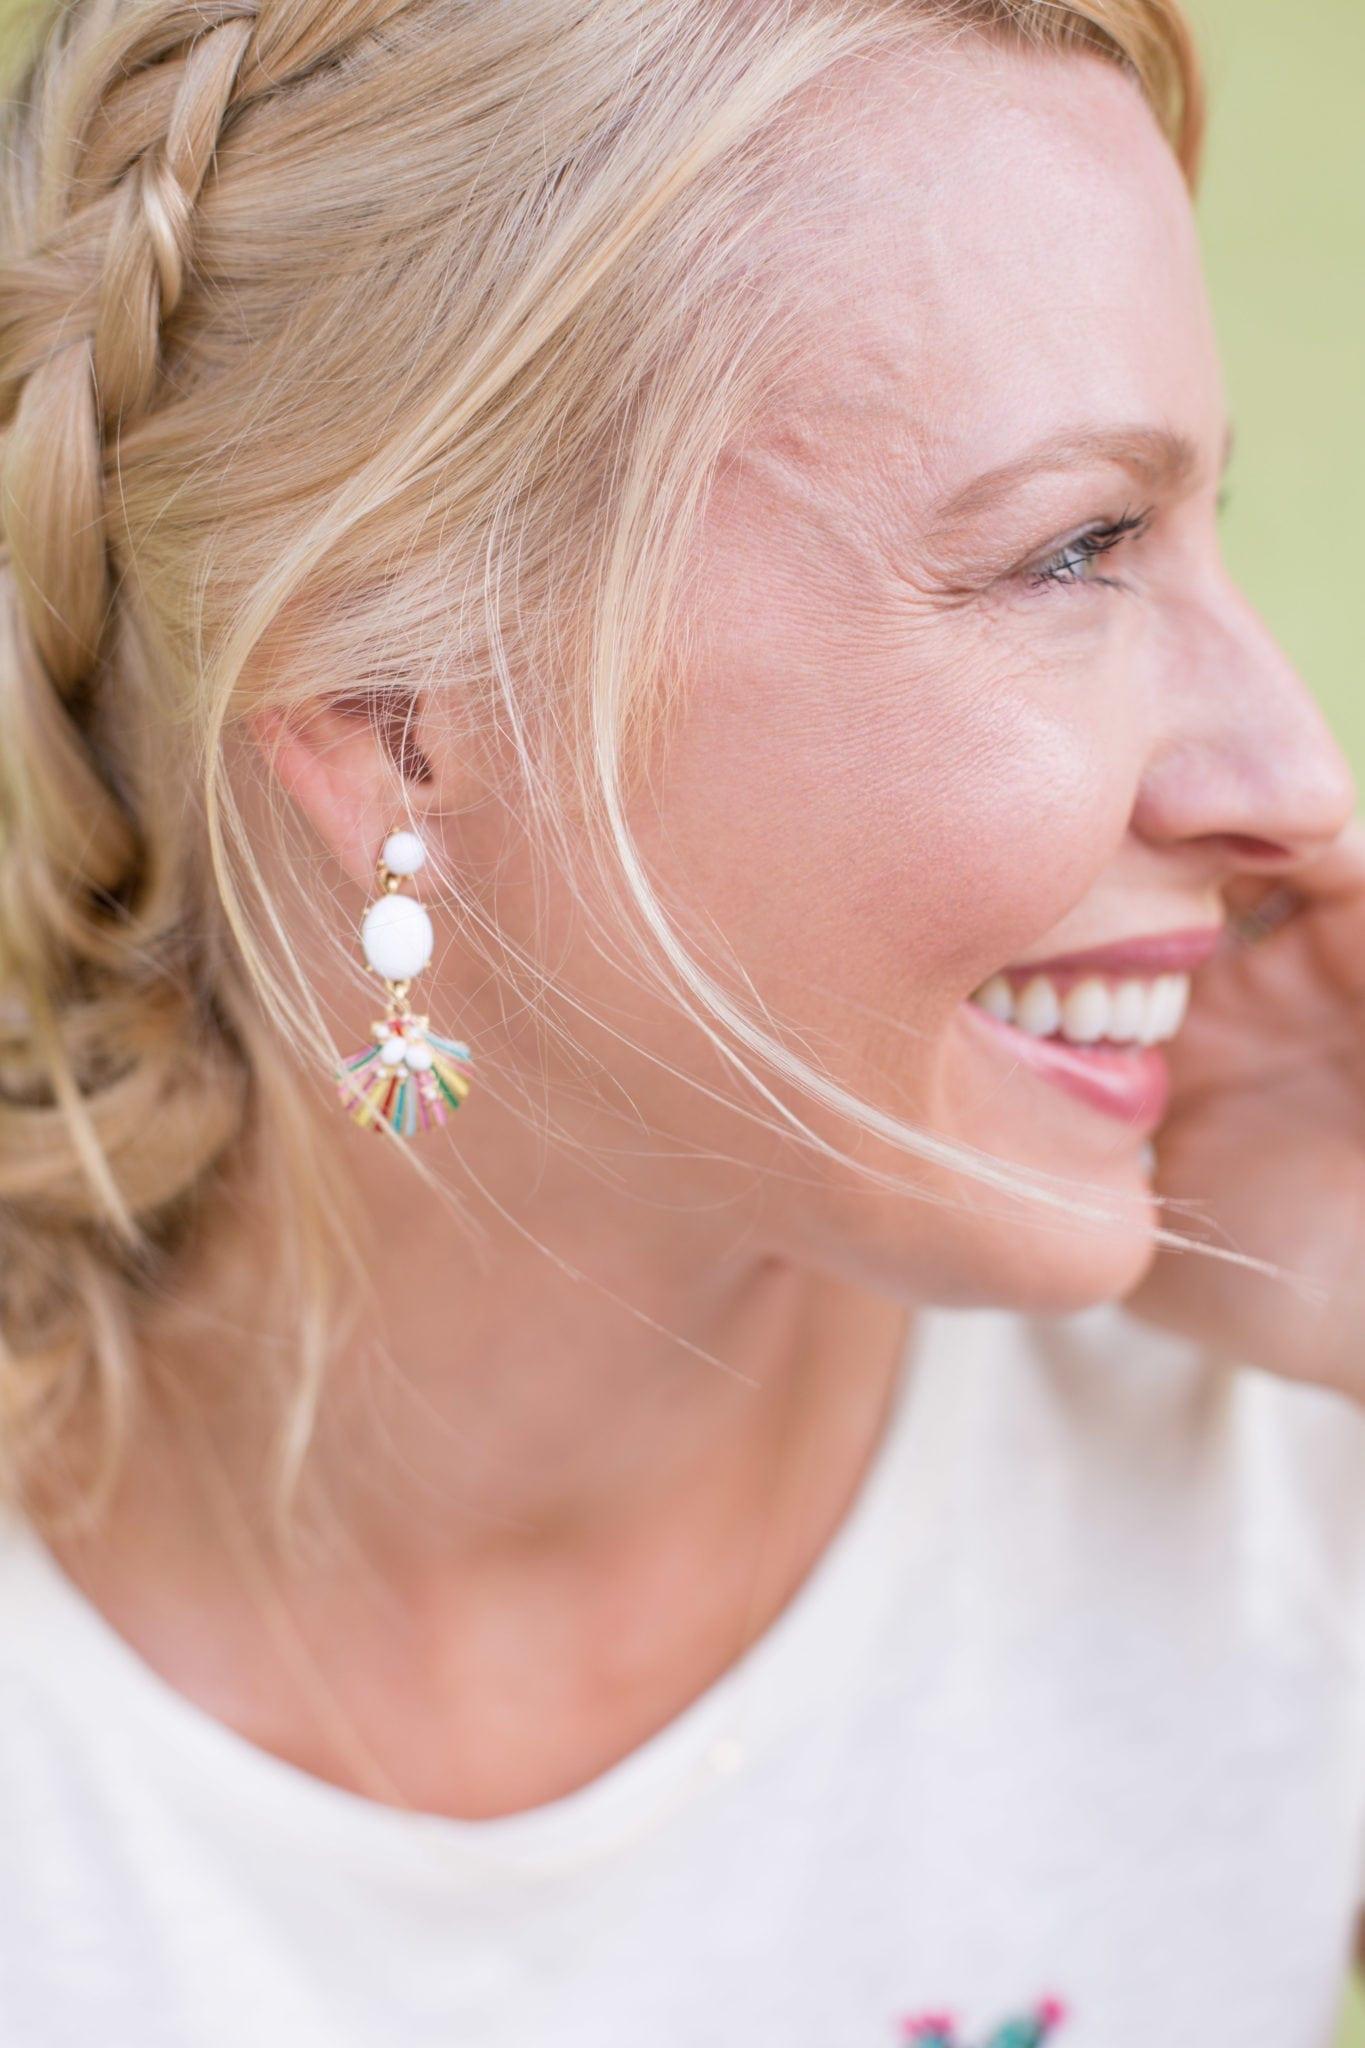 Summer earrings in white and shell design